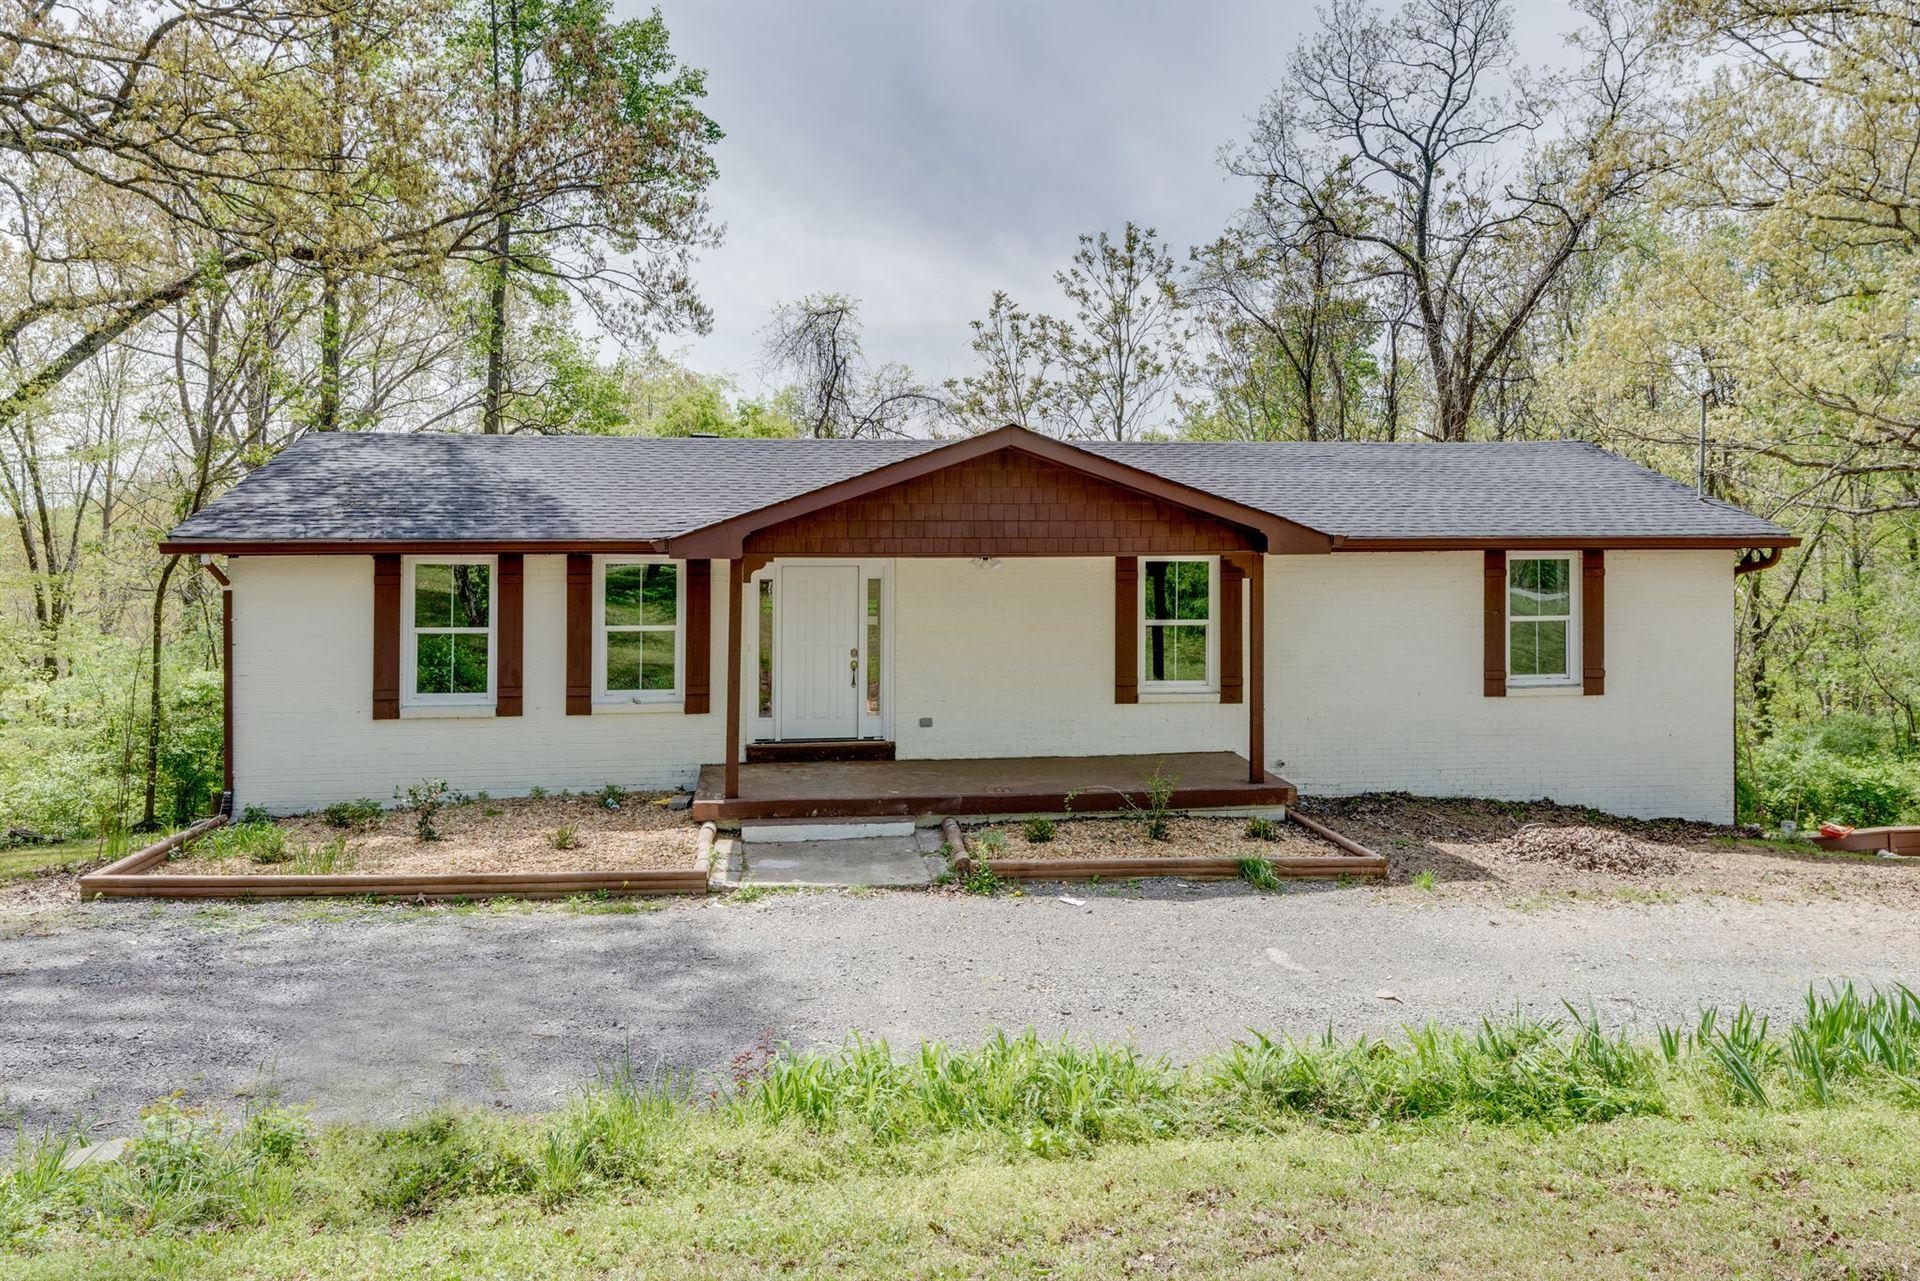 8517 Old Charlotte Pk, Pegram, TN 37143 - MLS#: 2140615